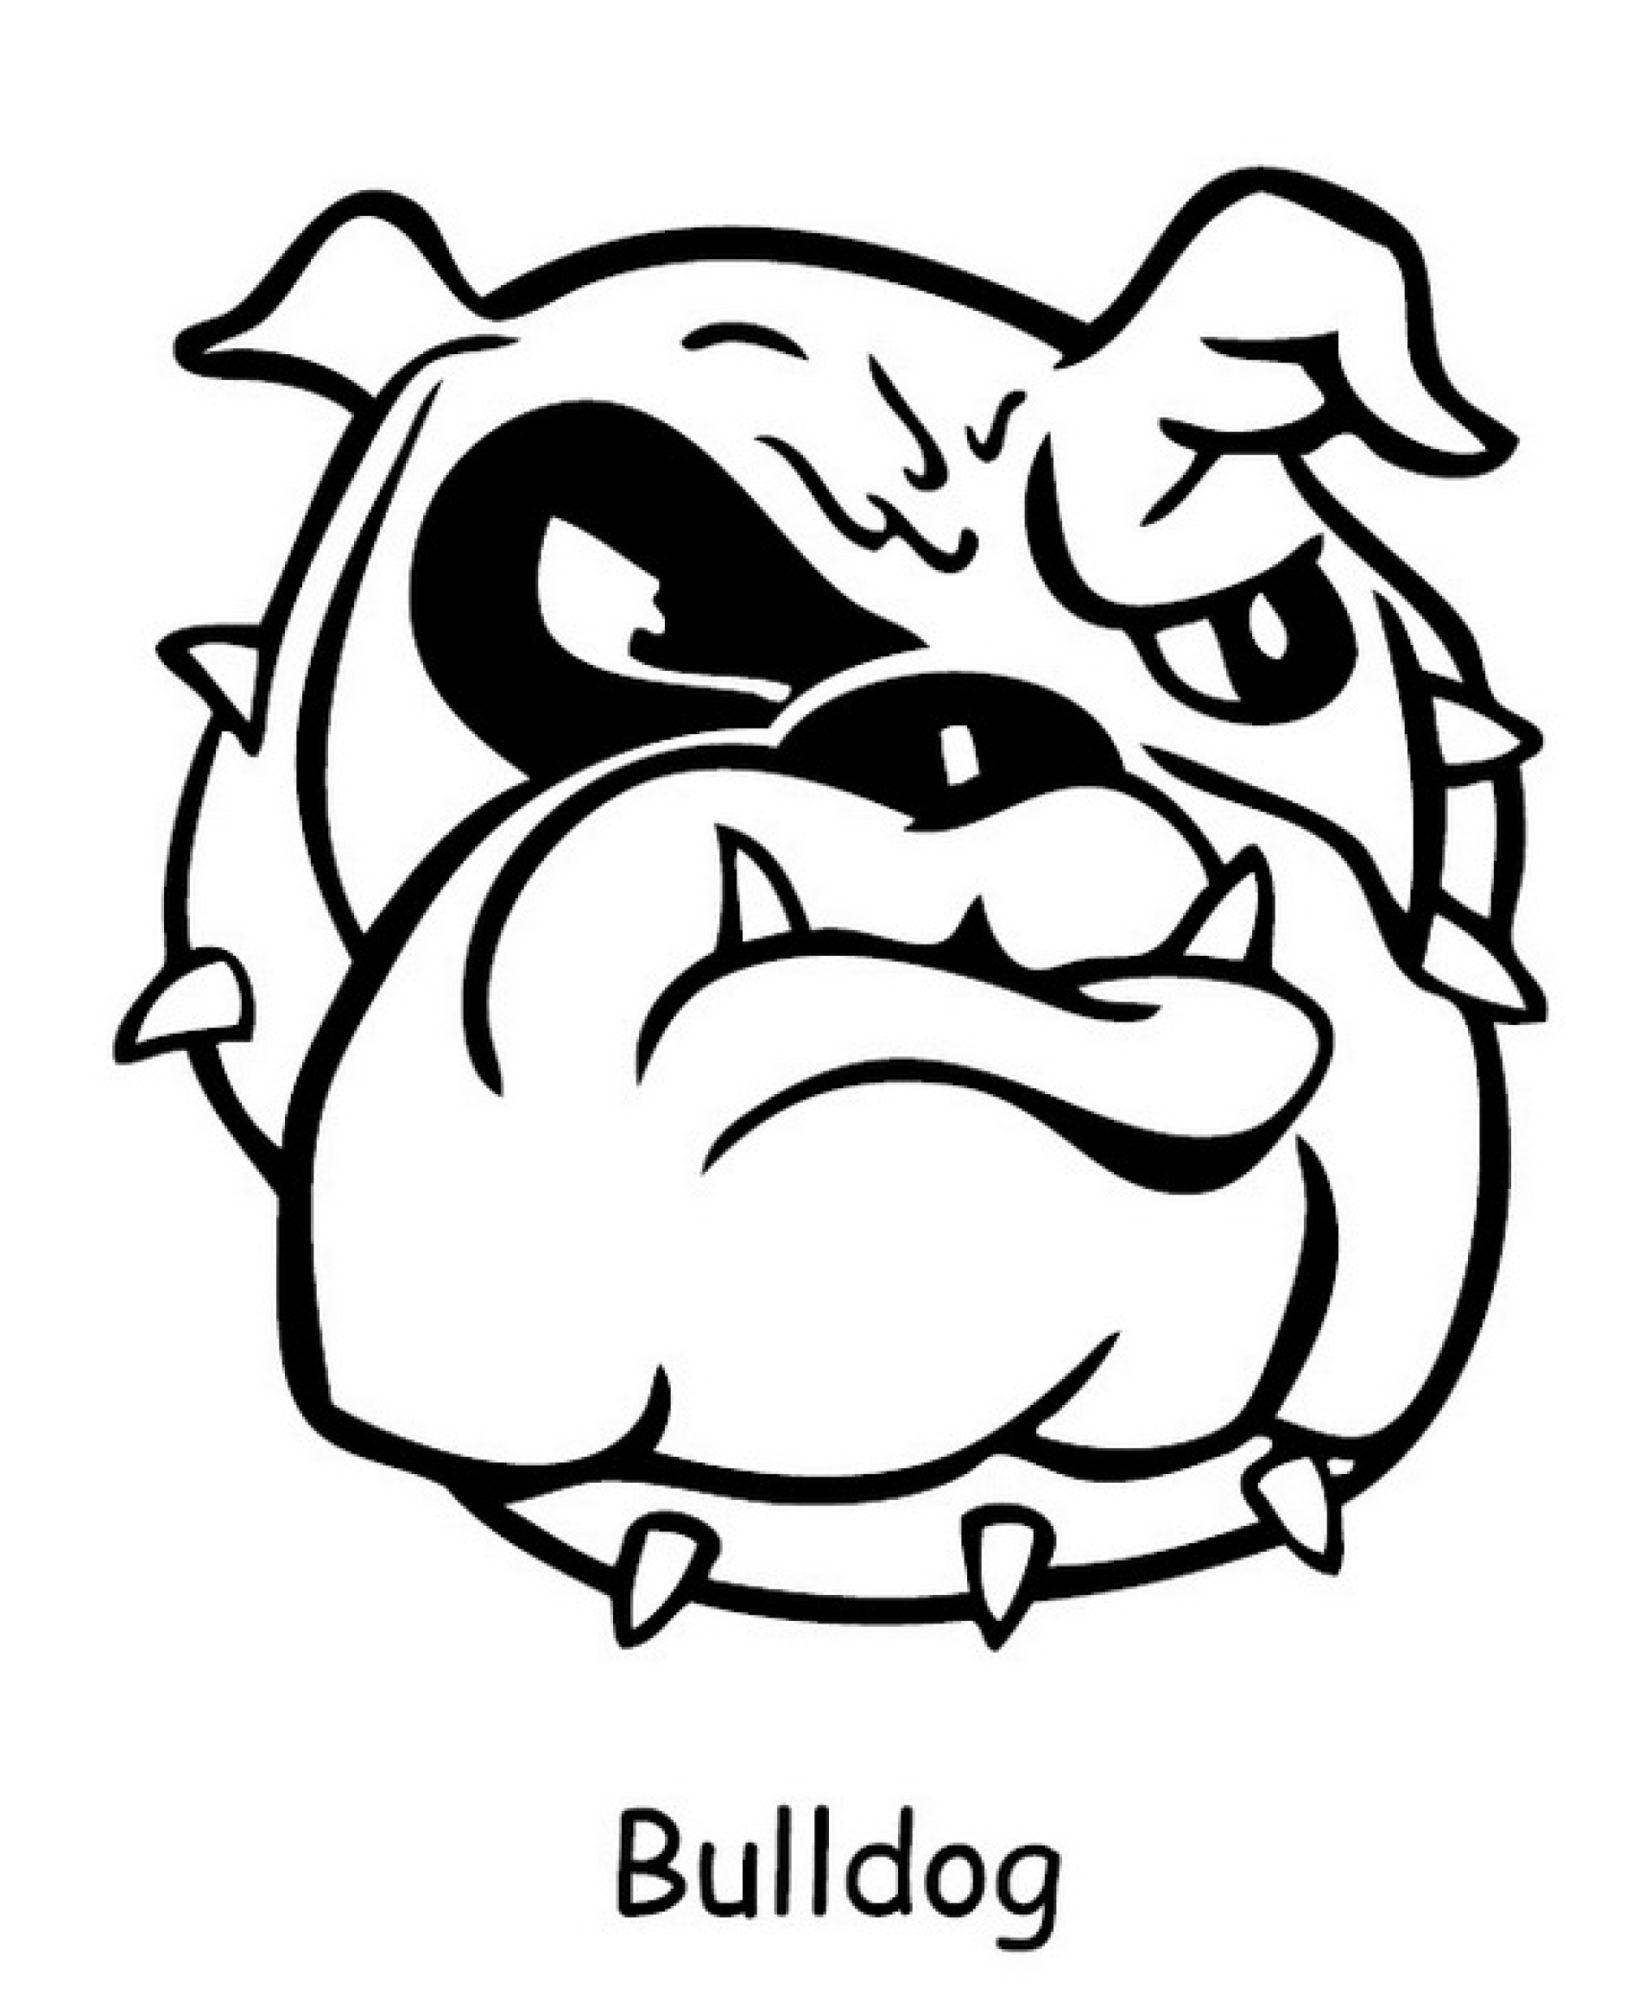 Cute Bulldog Cartoon Drawing Sketch Coloring Page Sketch Coloring